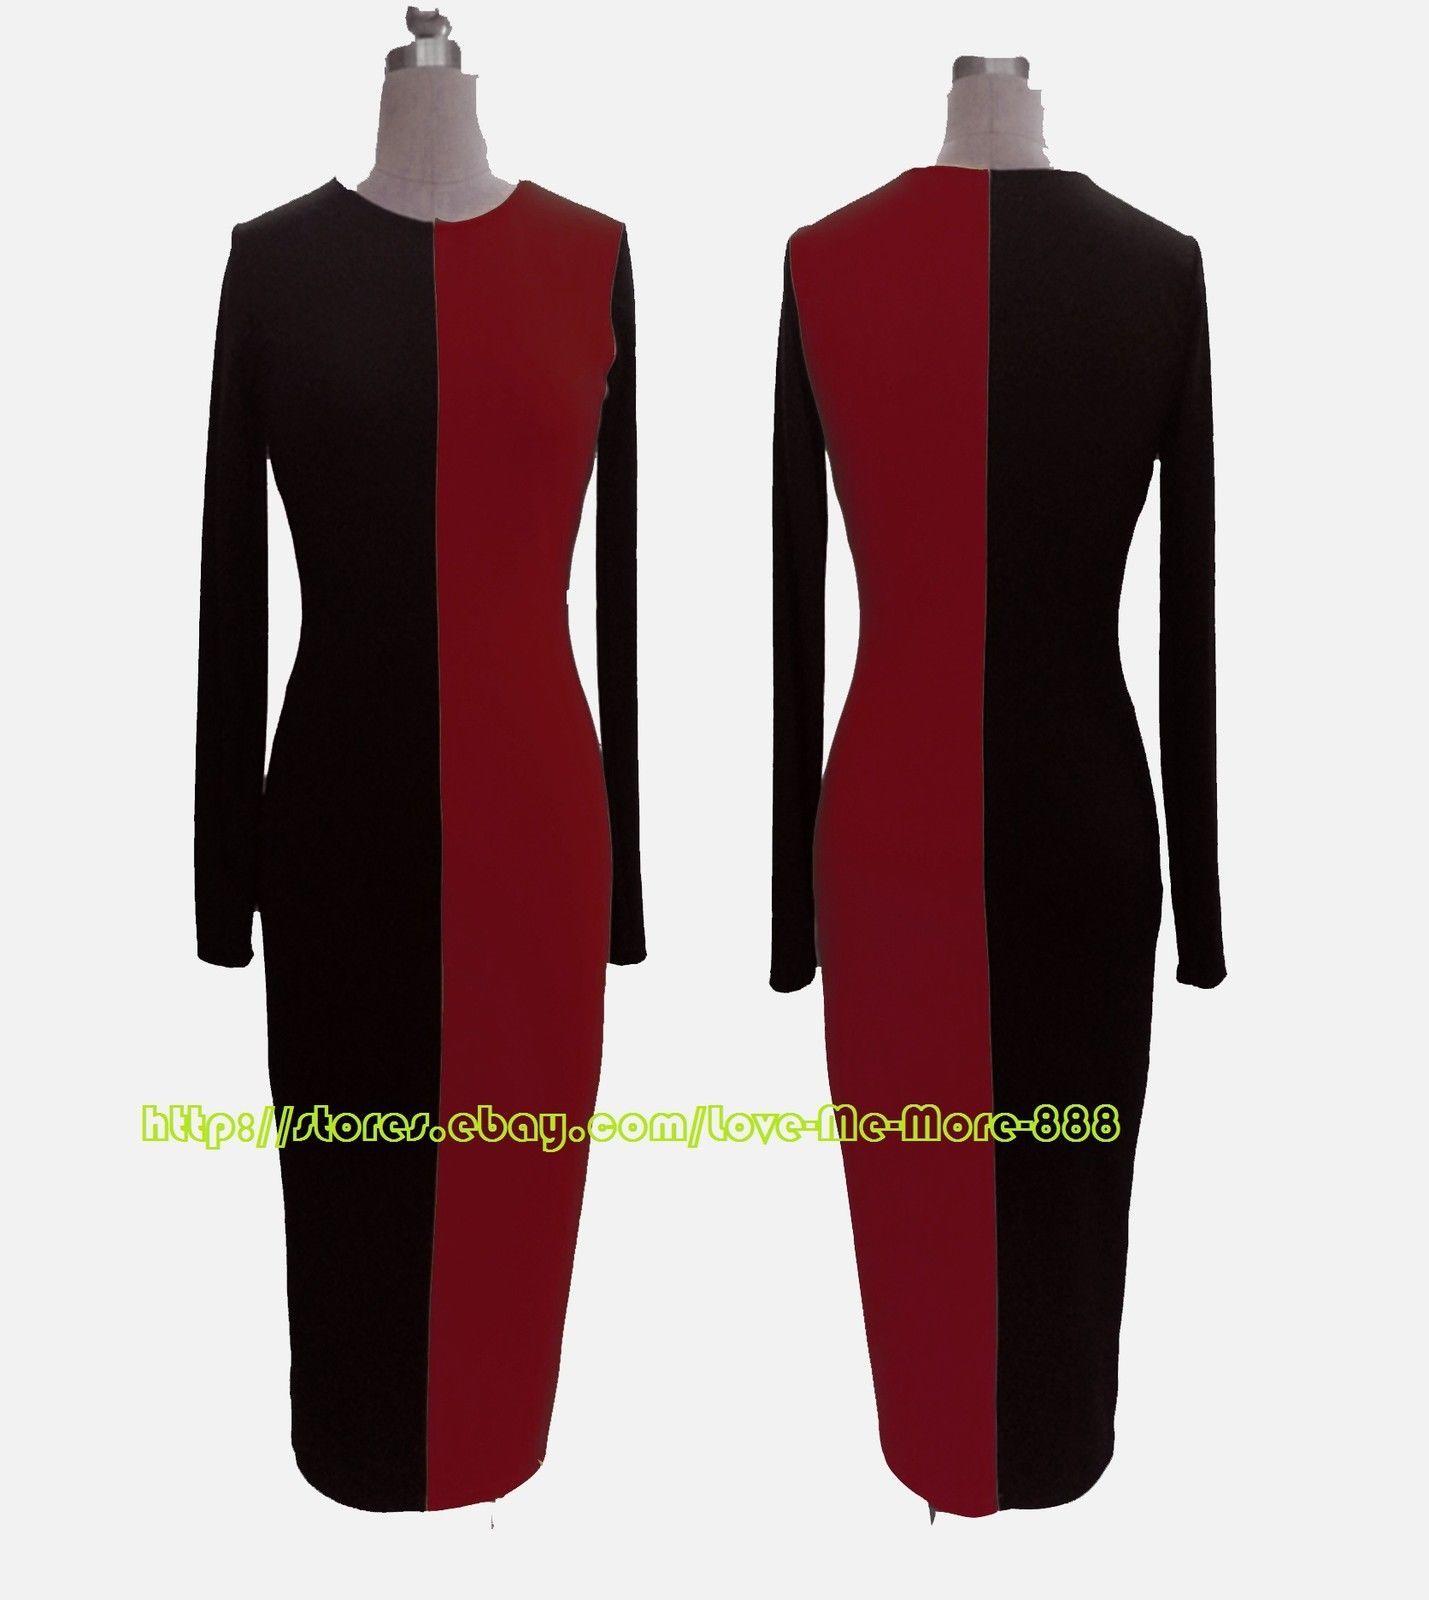 Sxl womens long sleeve colour block wiggle pencil casual fit